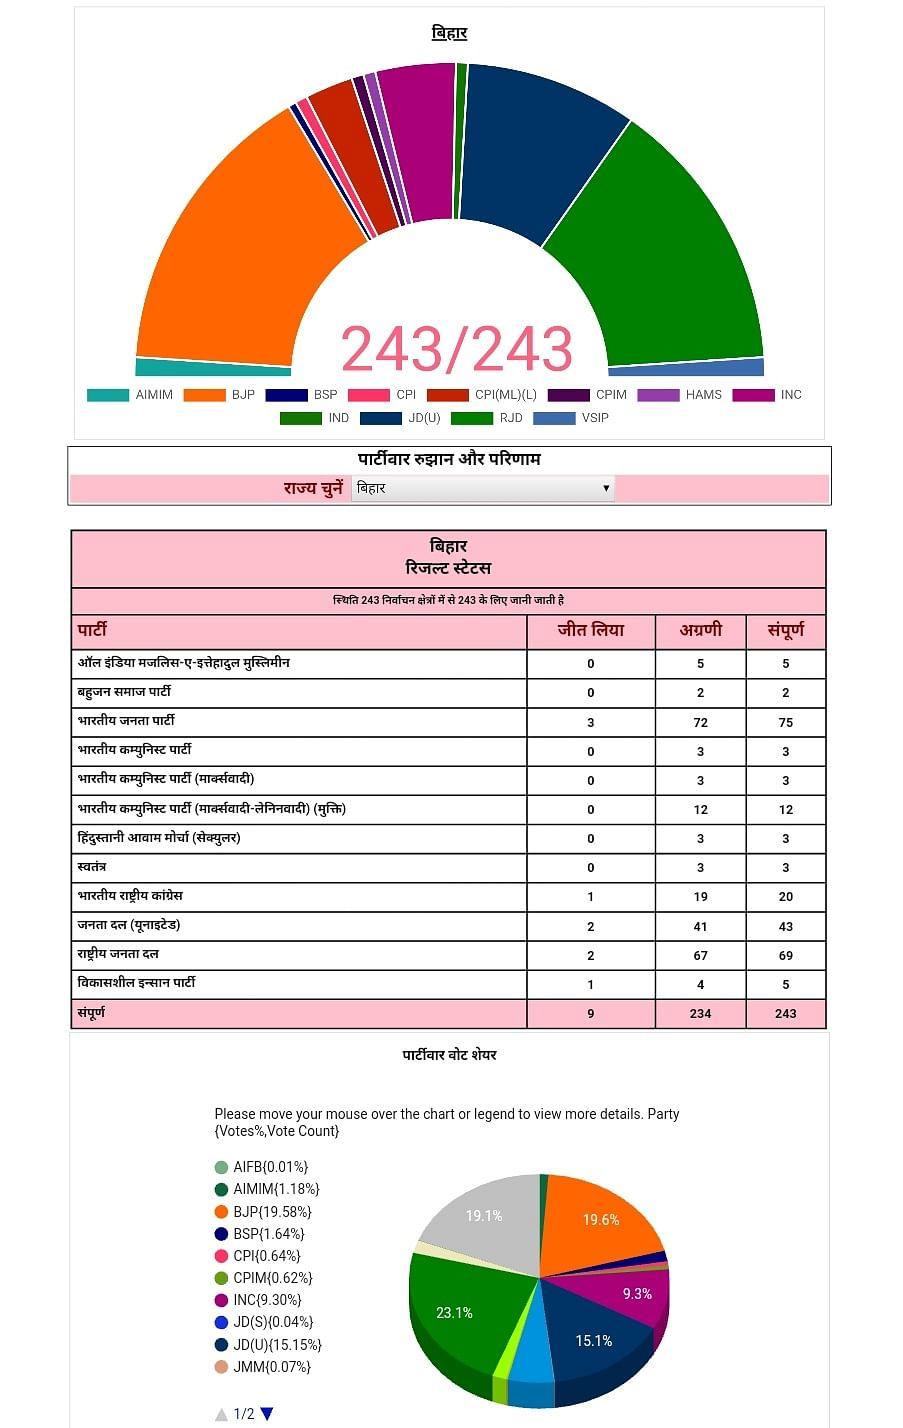 Bihar Chunav ke Natije: शाम साढ़े पांच तक का चुनावी परिणाम